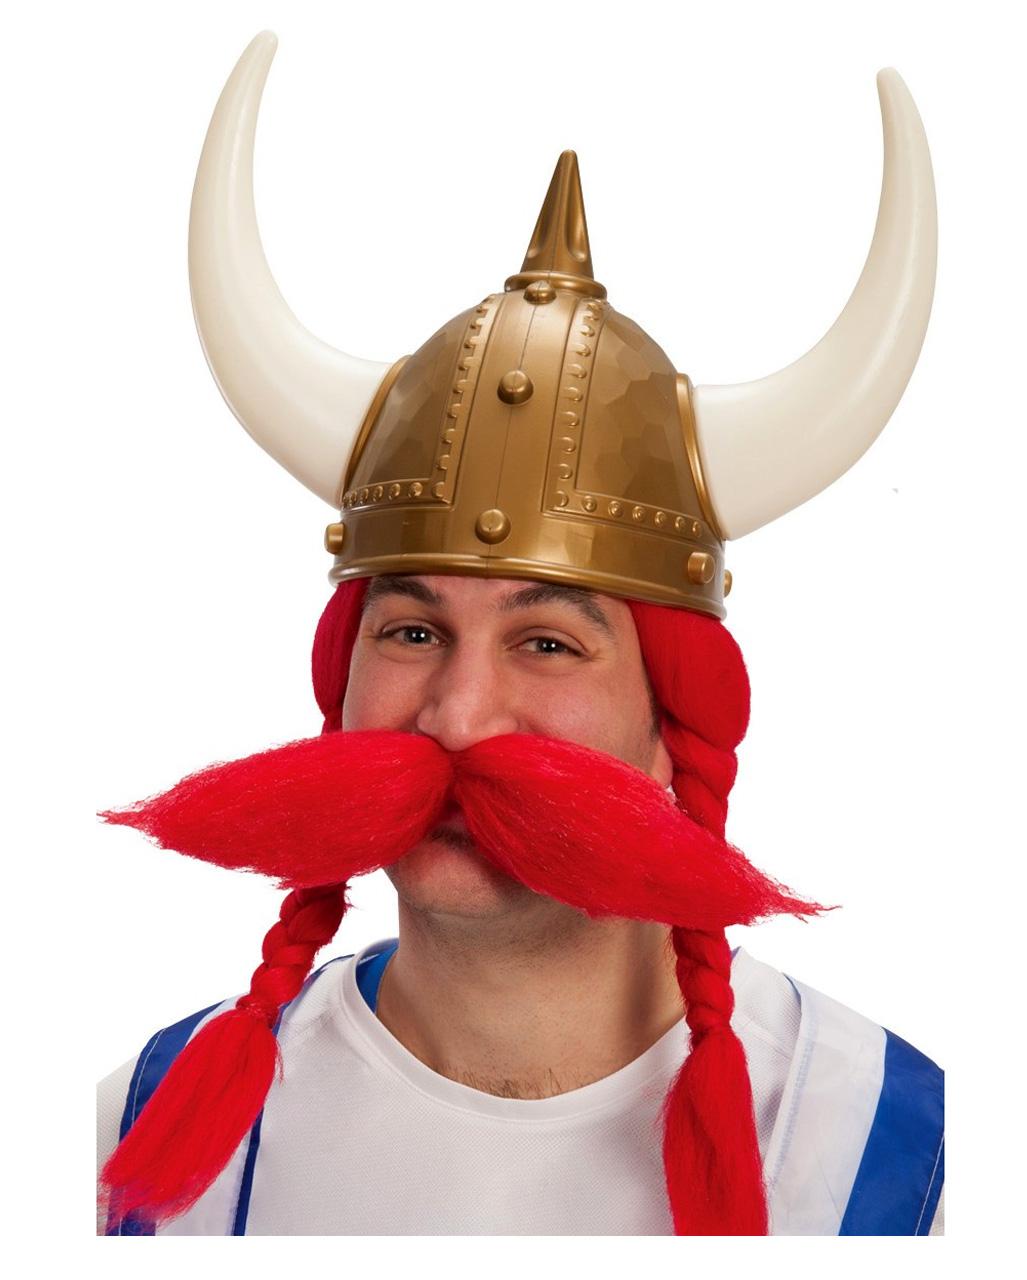 Goldener Wikinger Helm Kostumzubehor Kaufen Karneval Universe